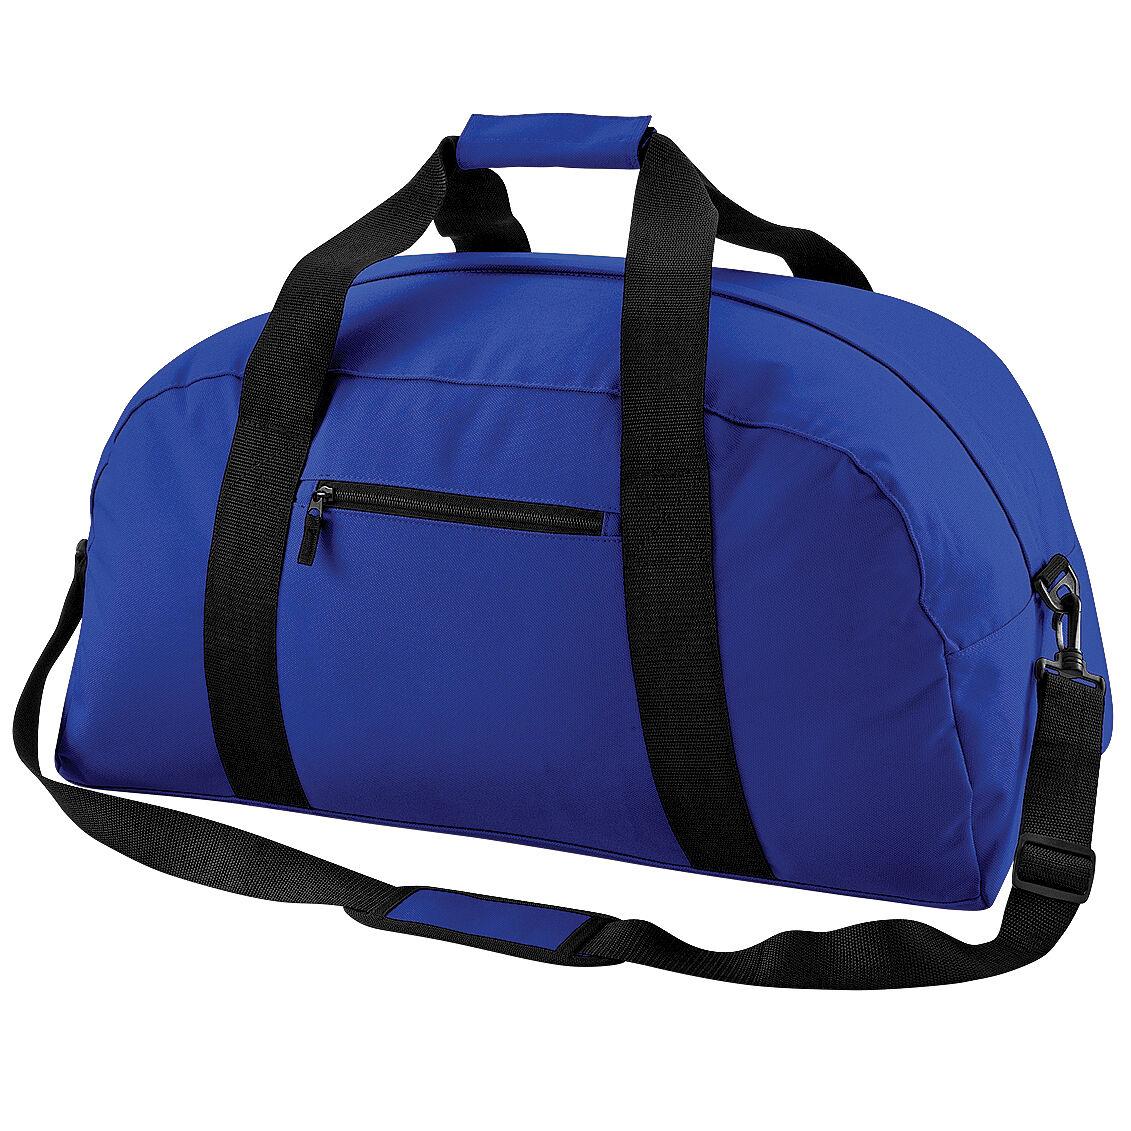 Bagbase - Sac De Voyage Classique (Lot De 2) (Bleu roi vif) - UTRW6923